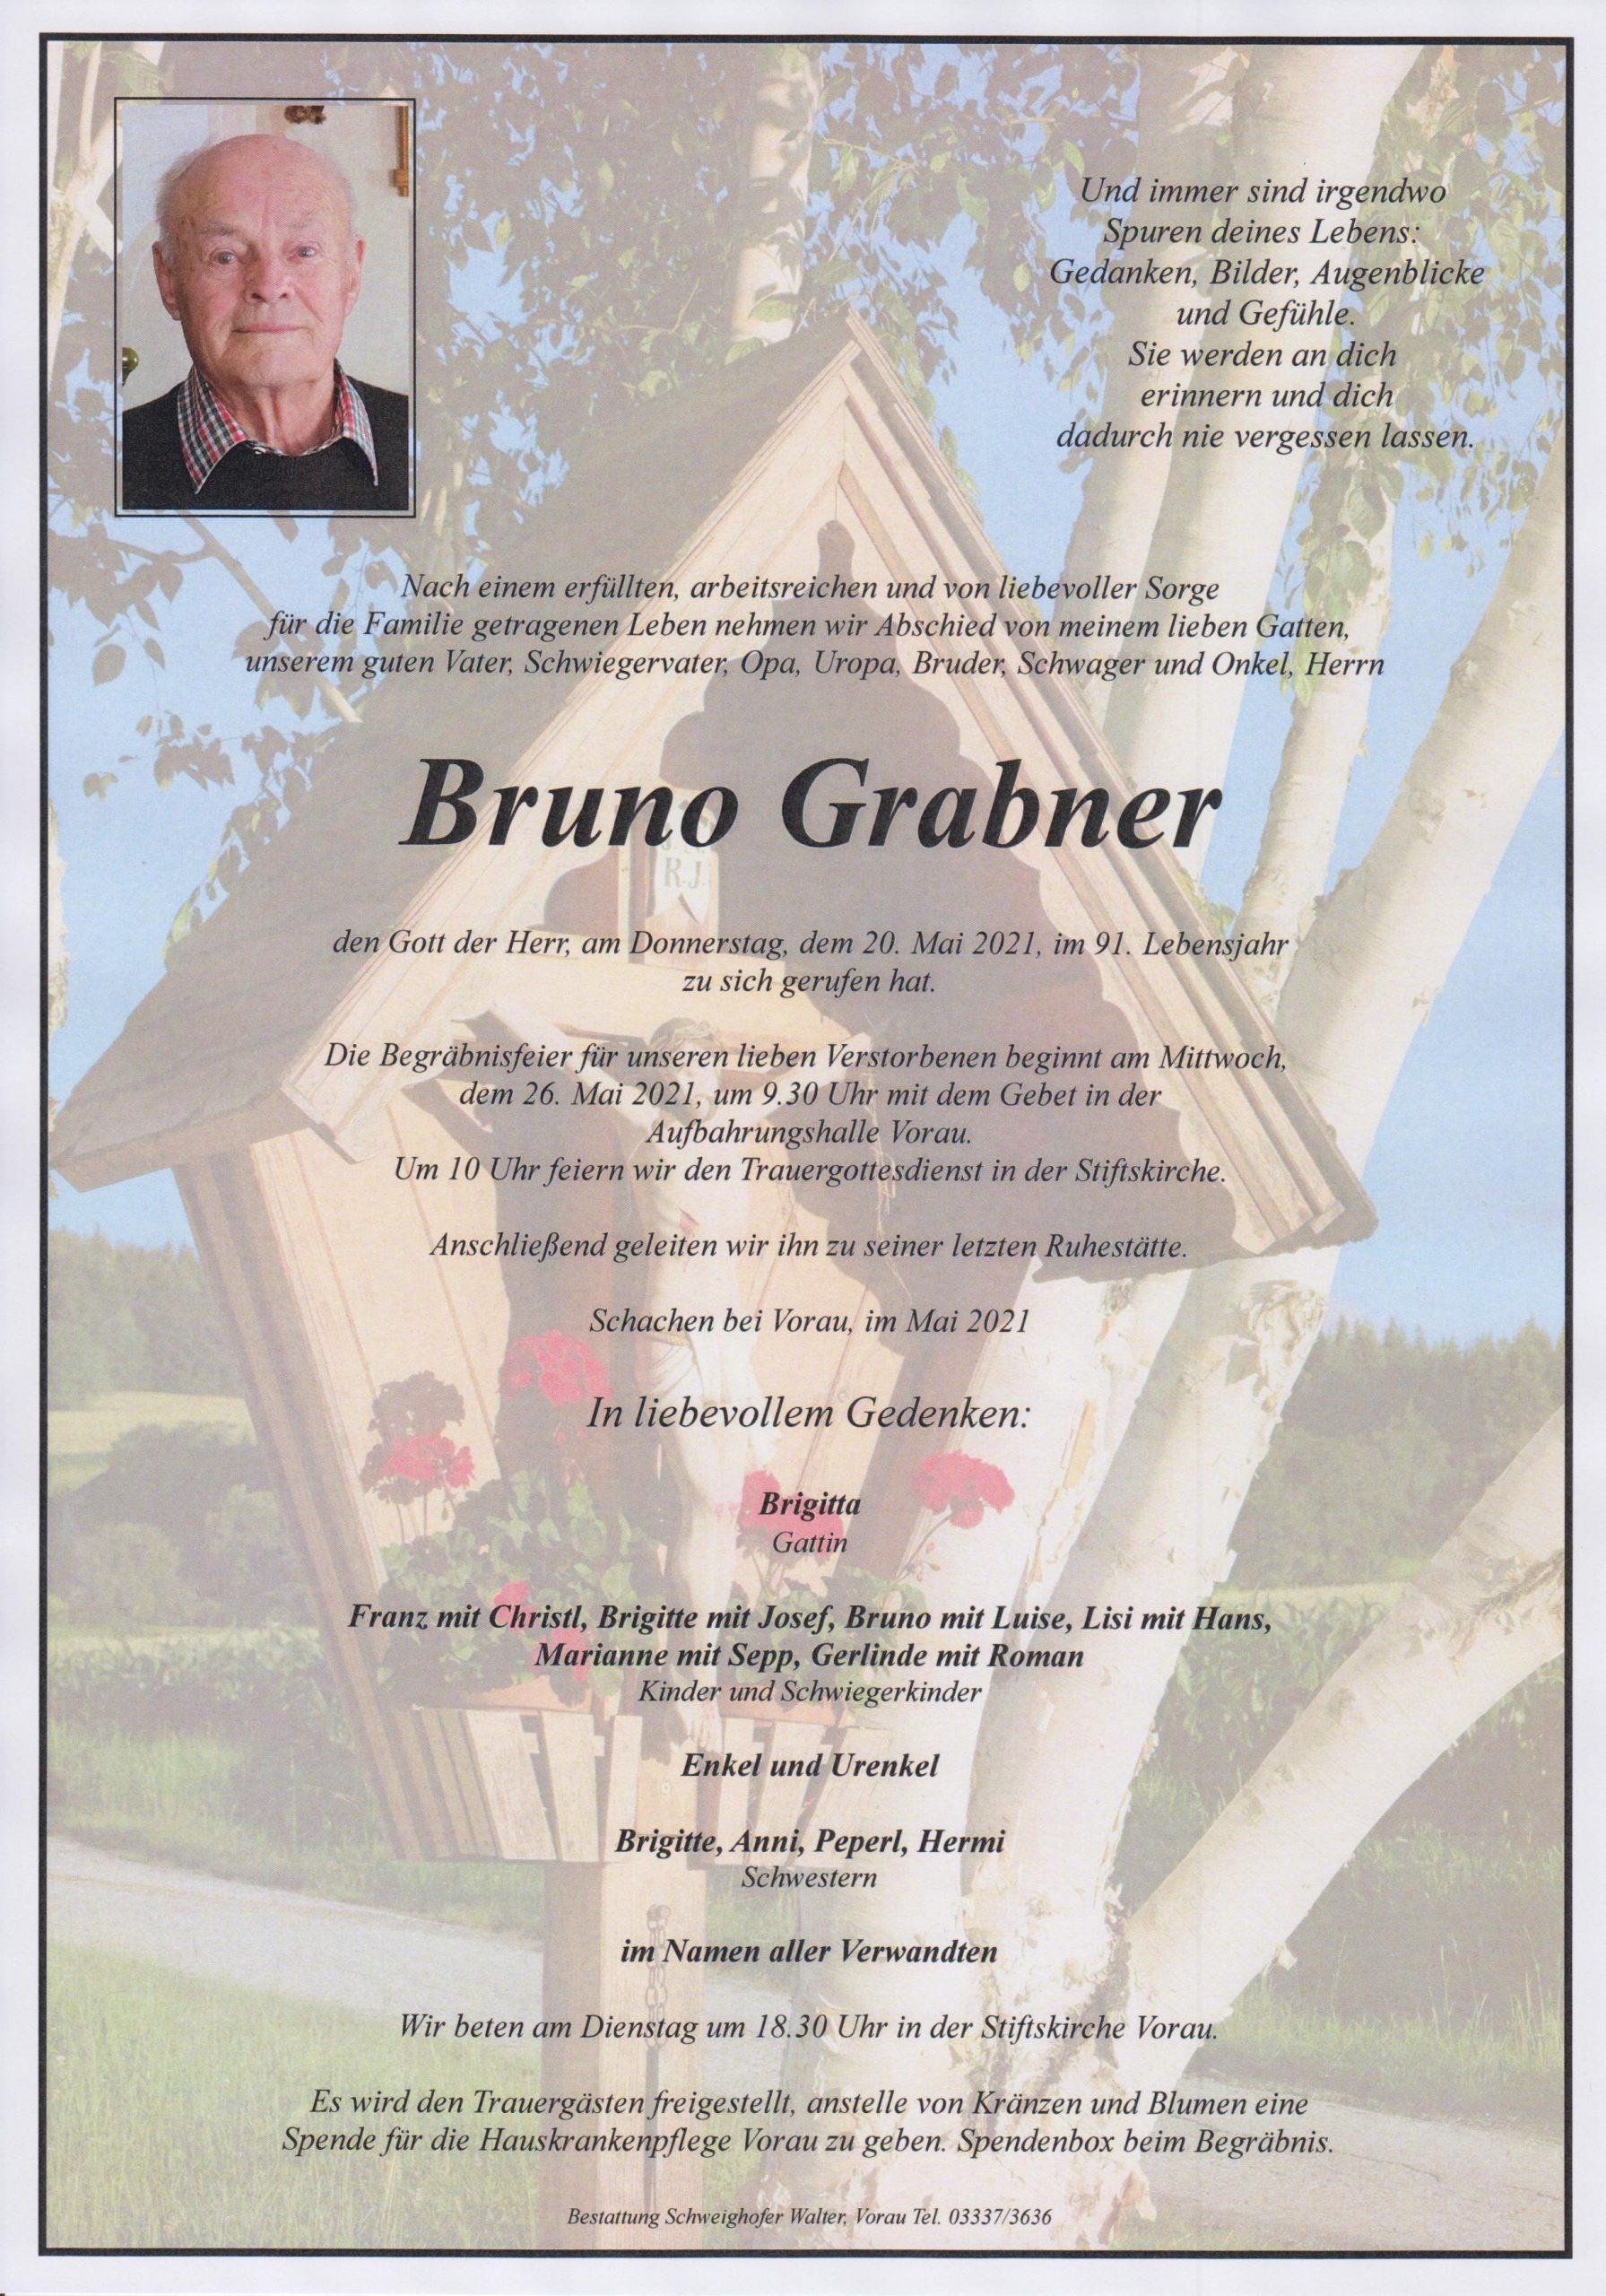 Bruno Grabner